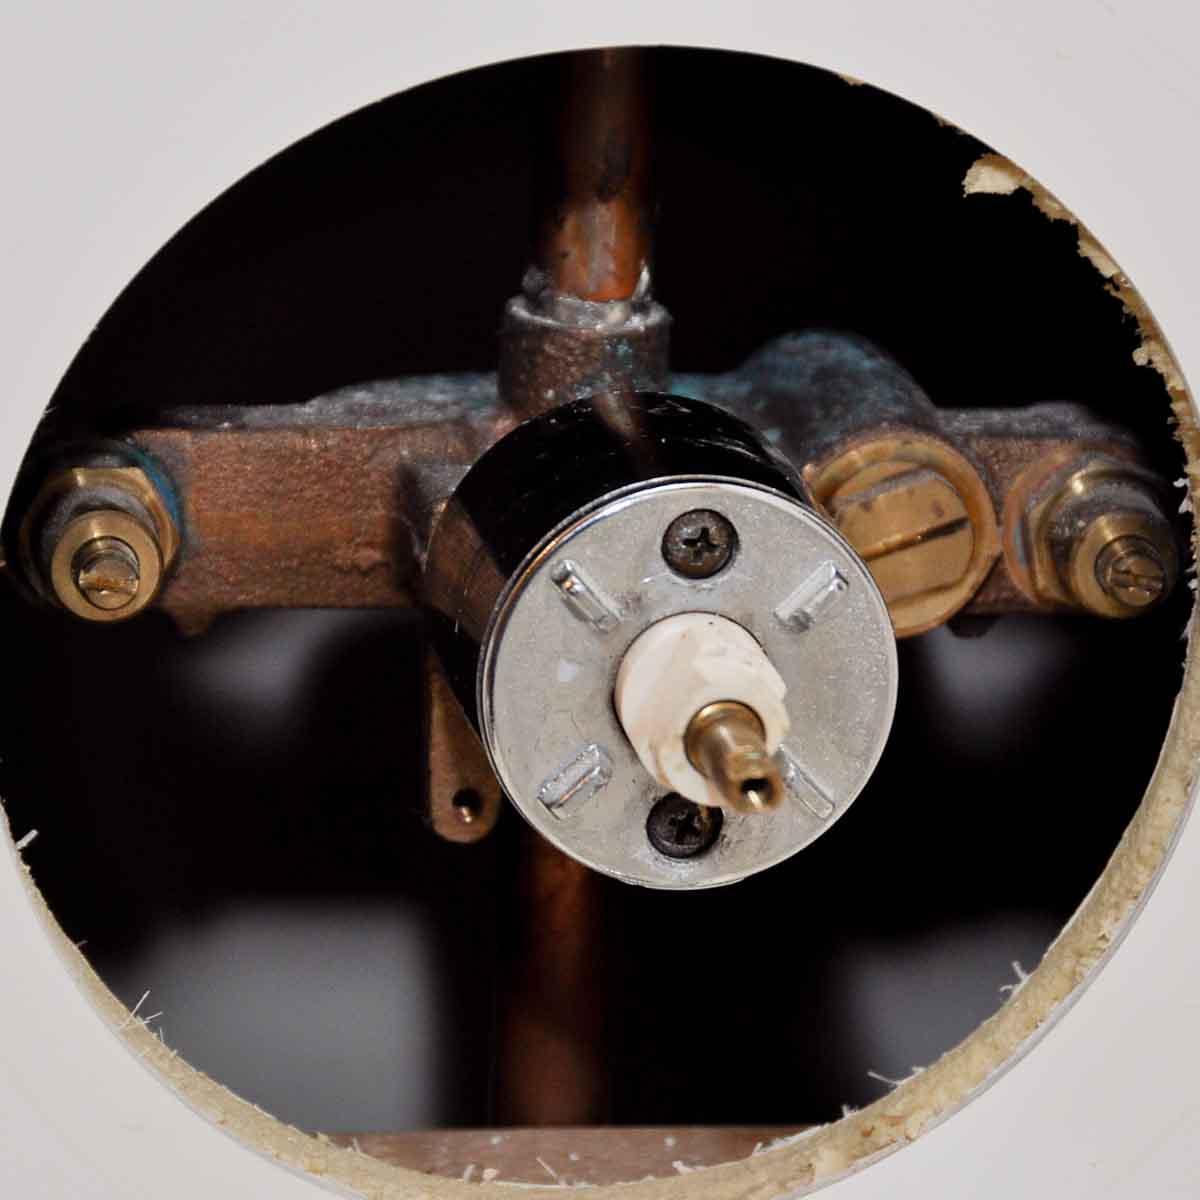 The Obsolete Mixet Shower Valve - Plumbing - DIY Home Improvement ...